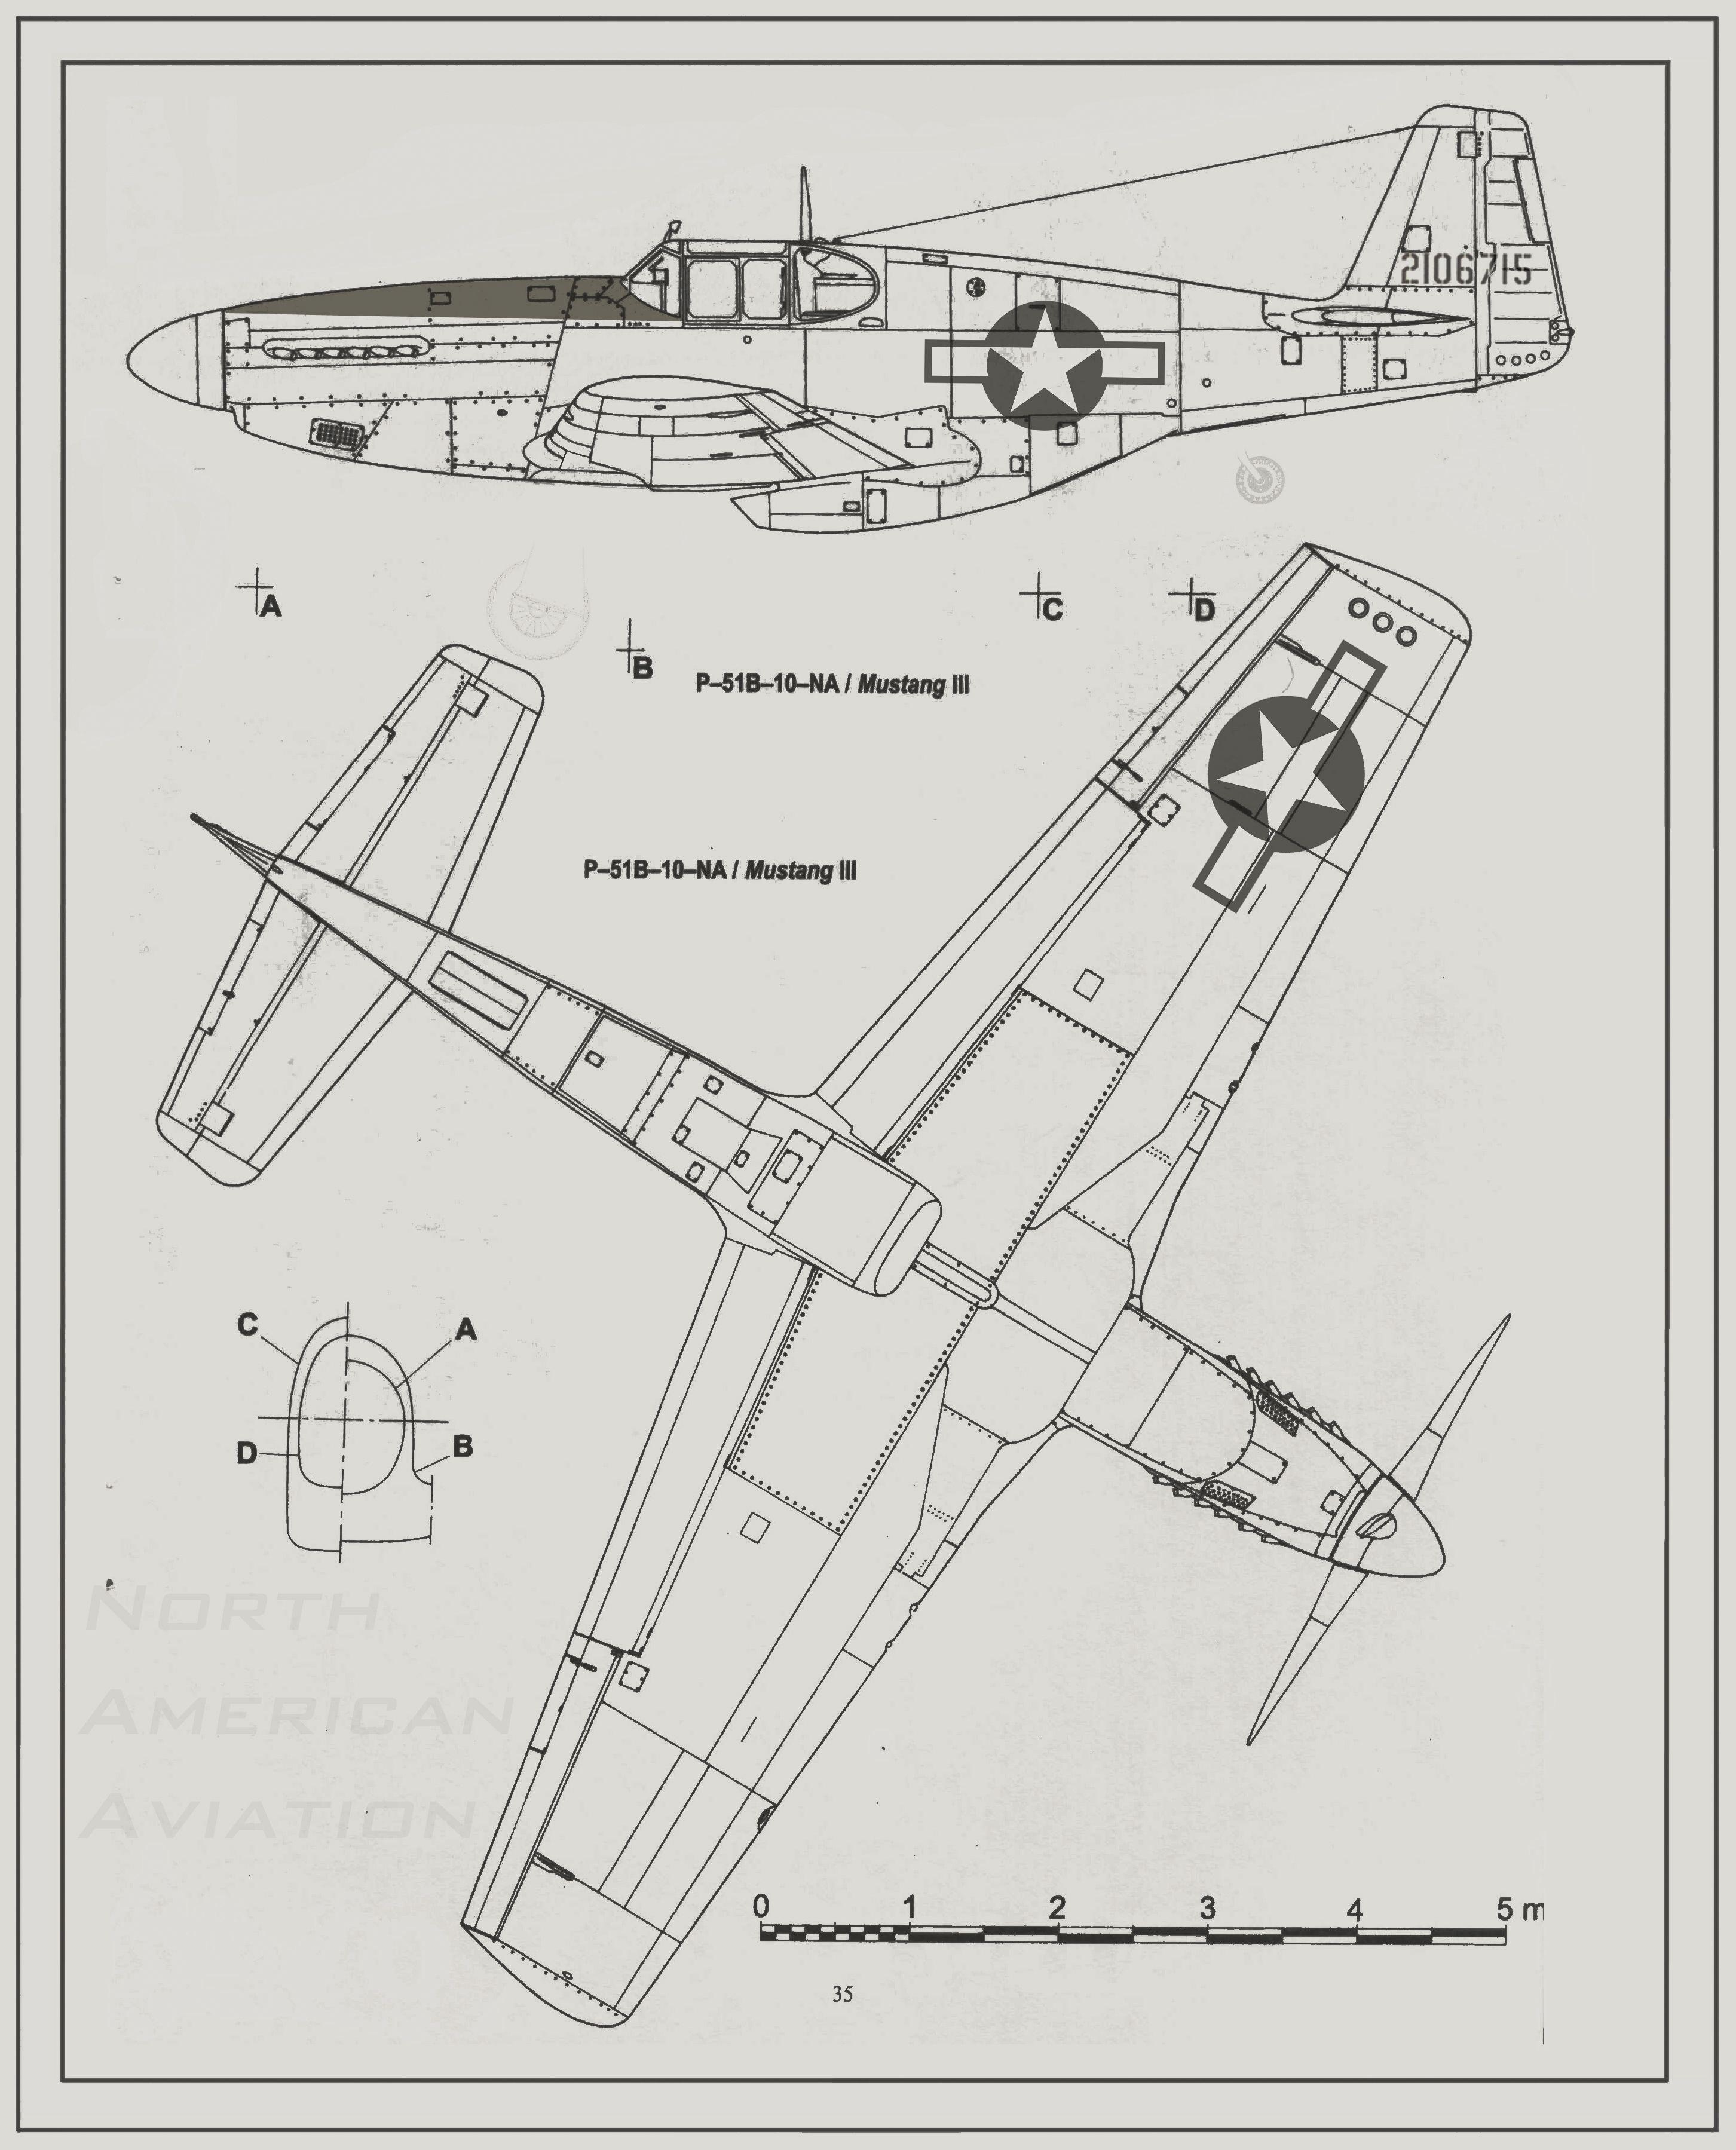 176 WW II P-51 Mustang Airplane Blueprint Plan